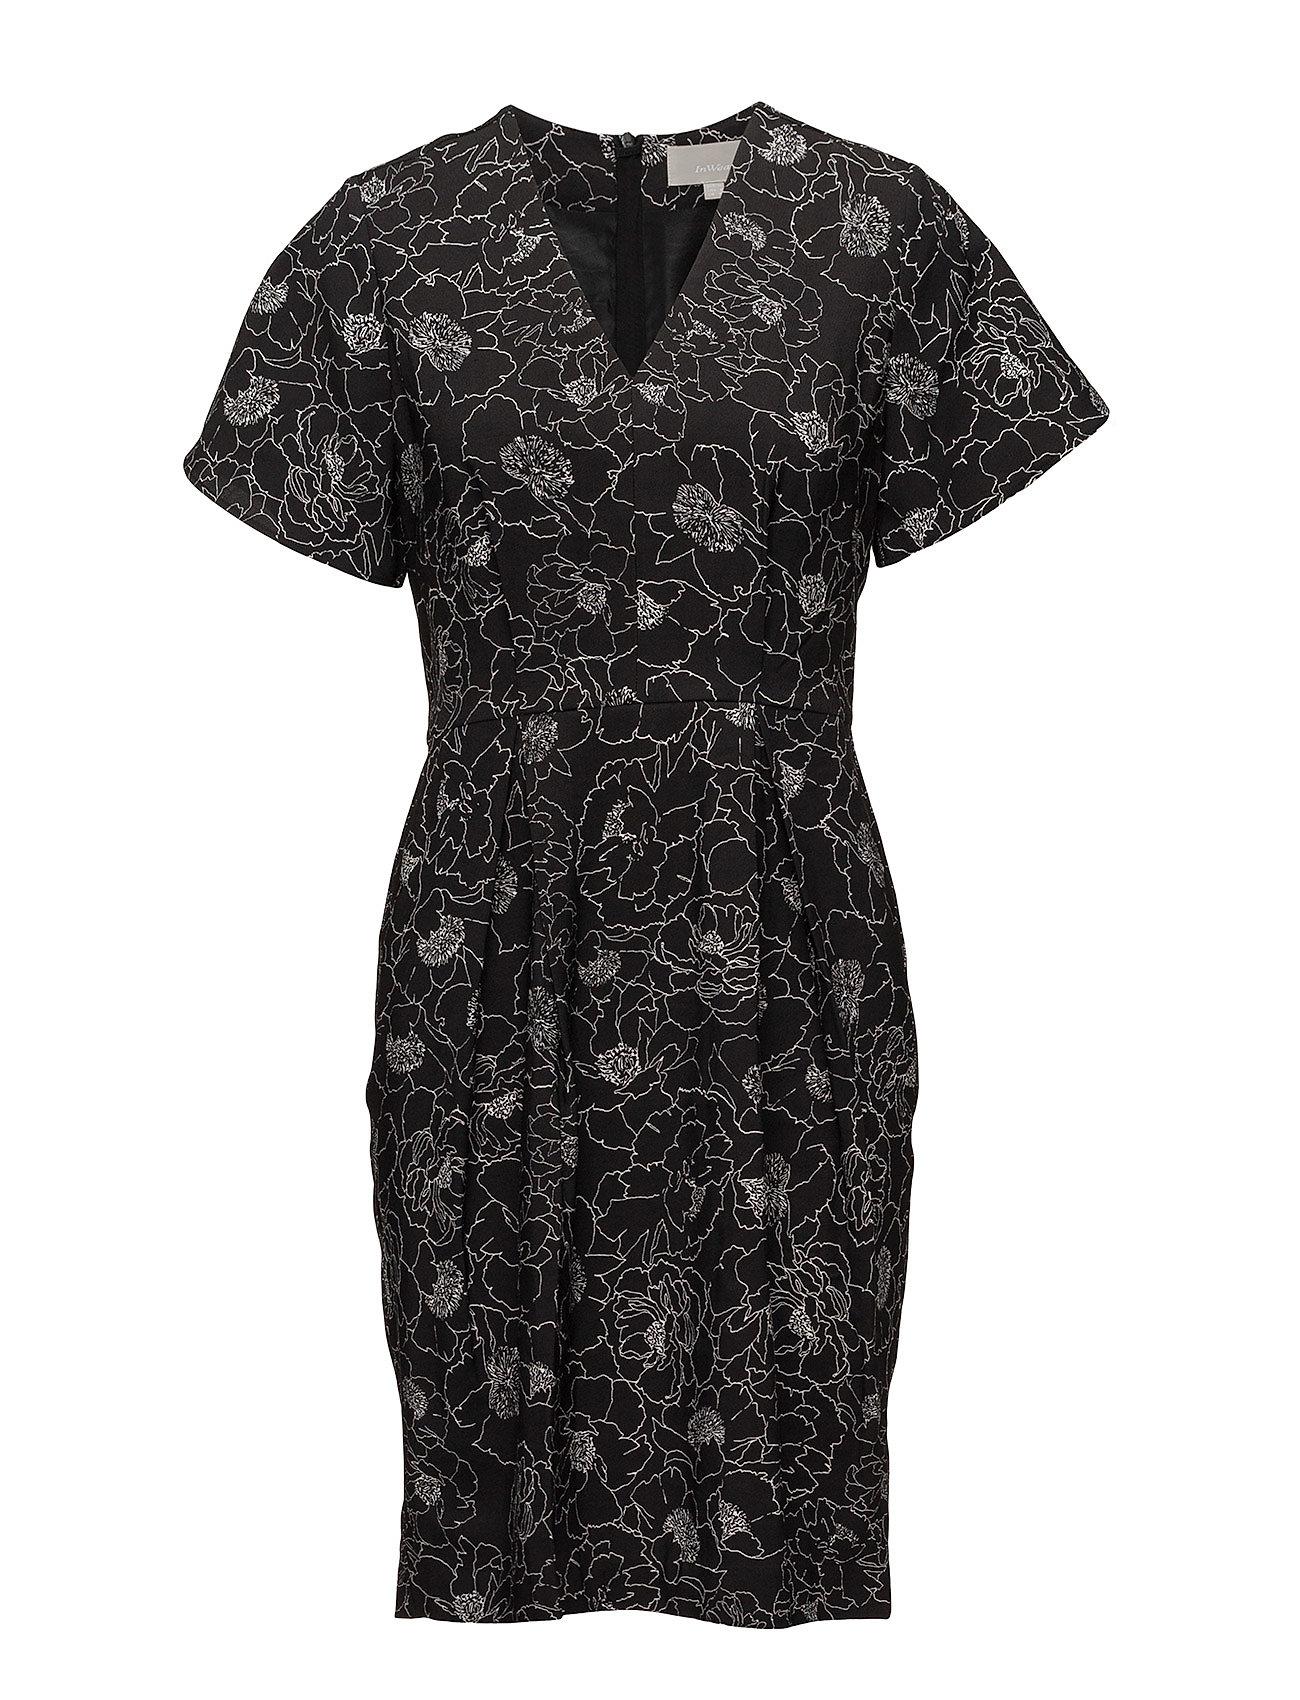 904572329c25 InWear Beretta Short Dress Lw (Pencil Flower Black)